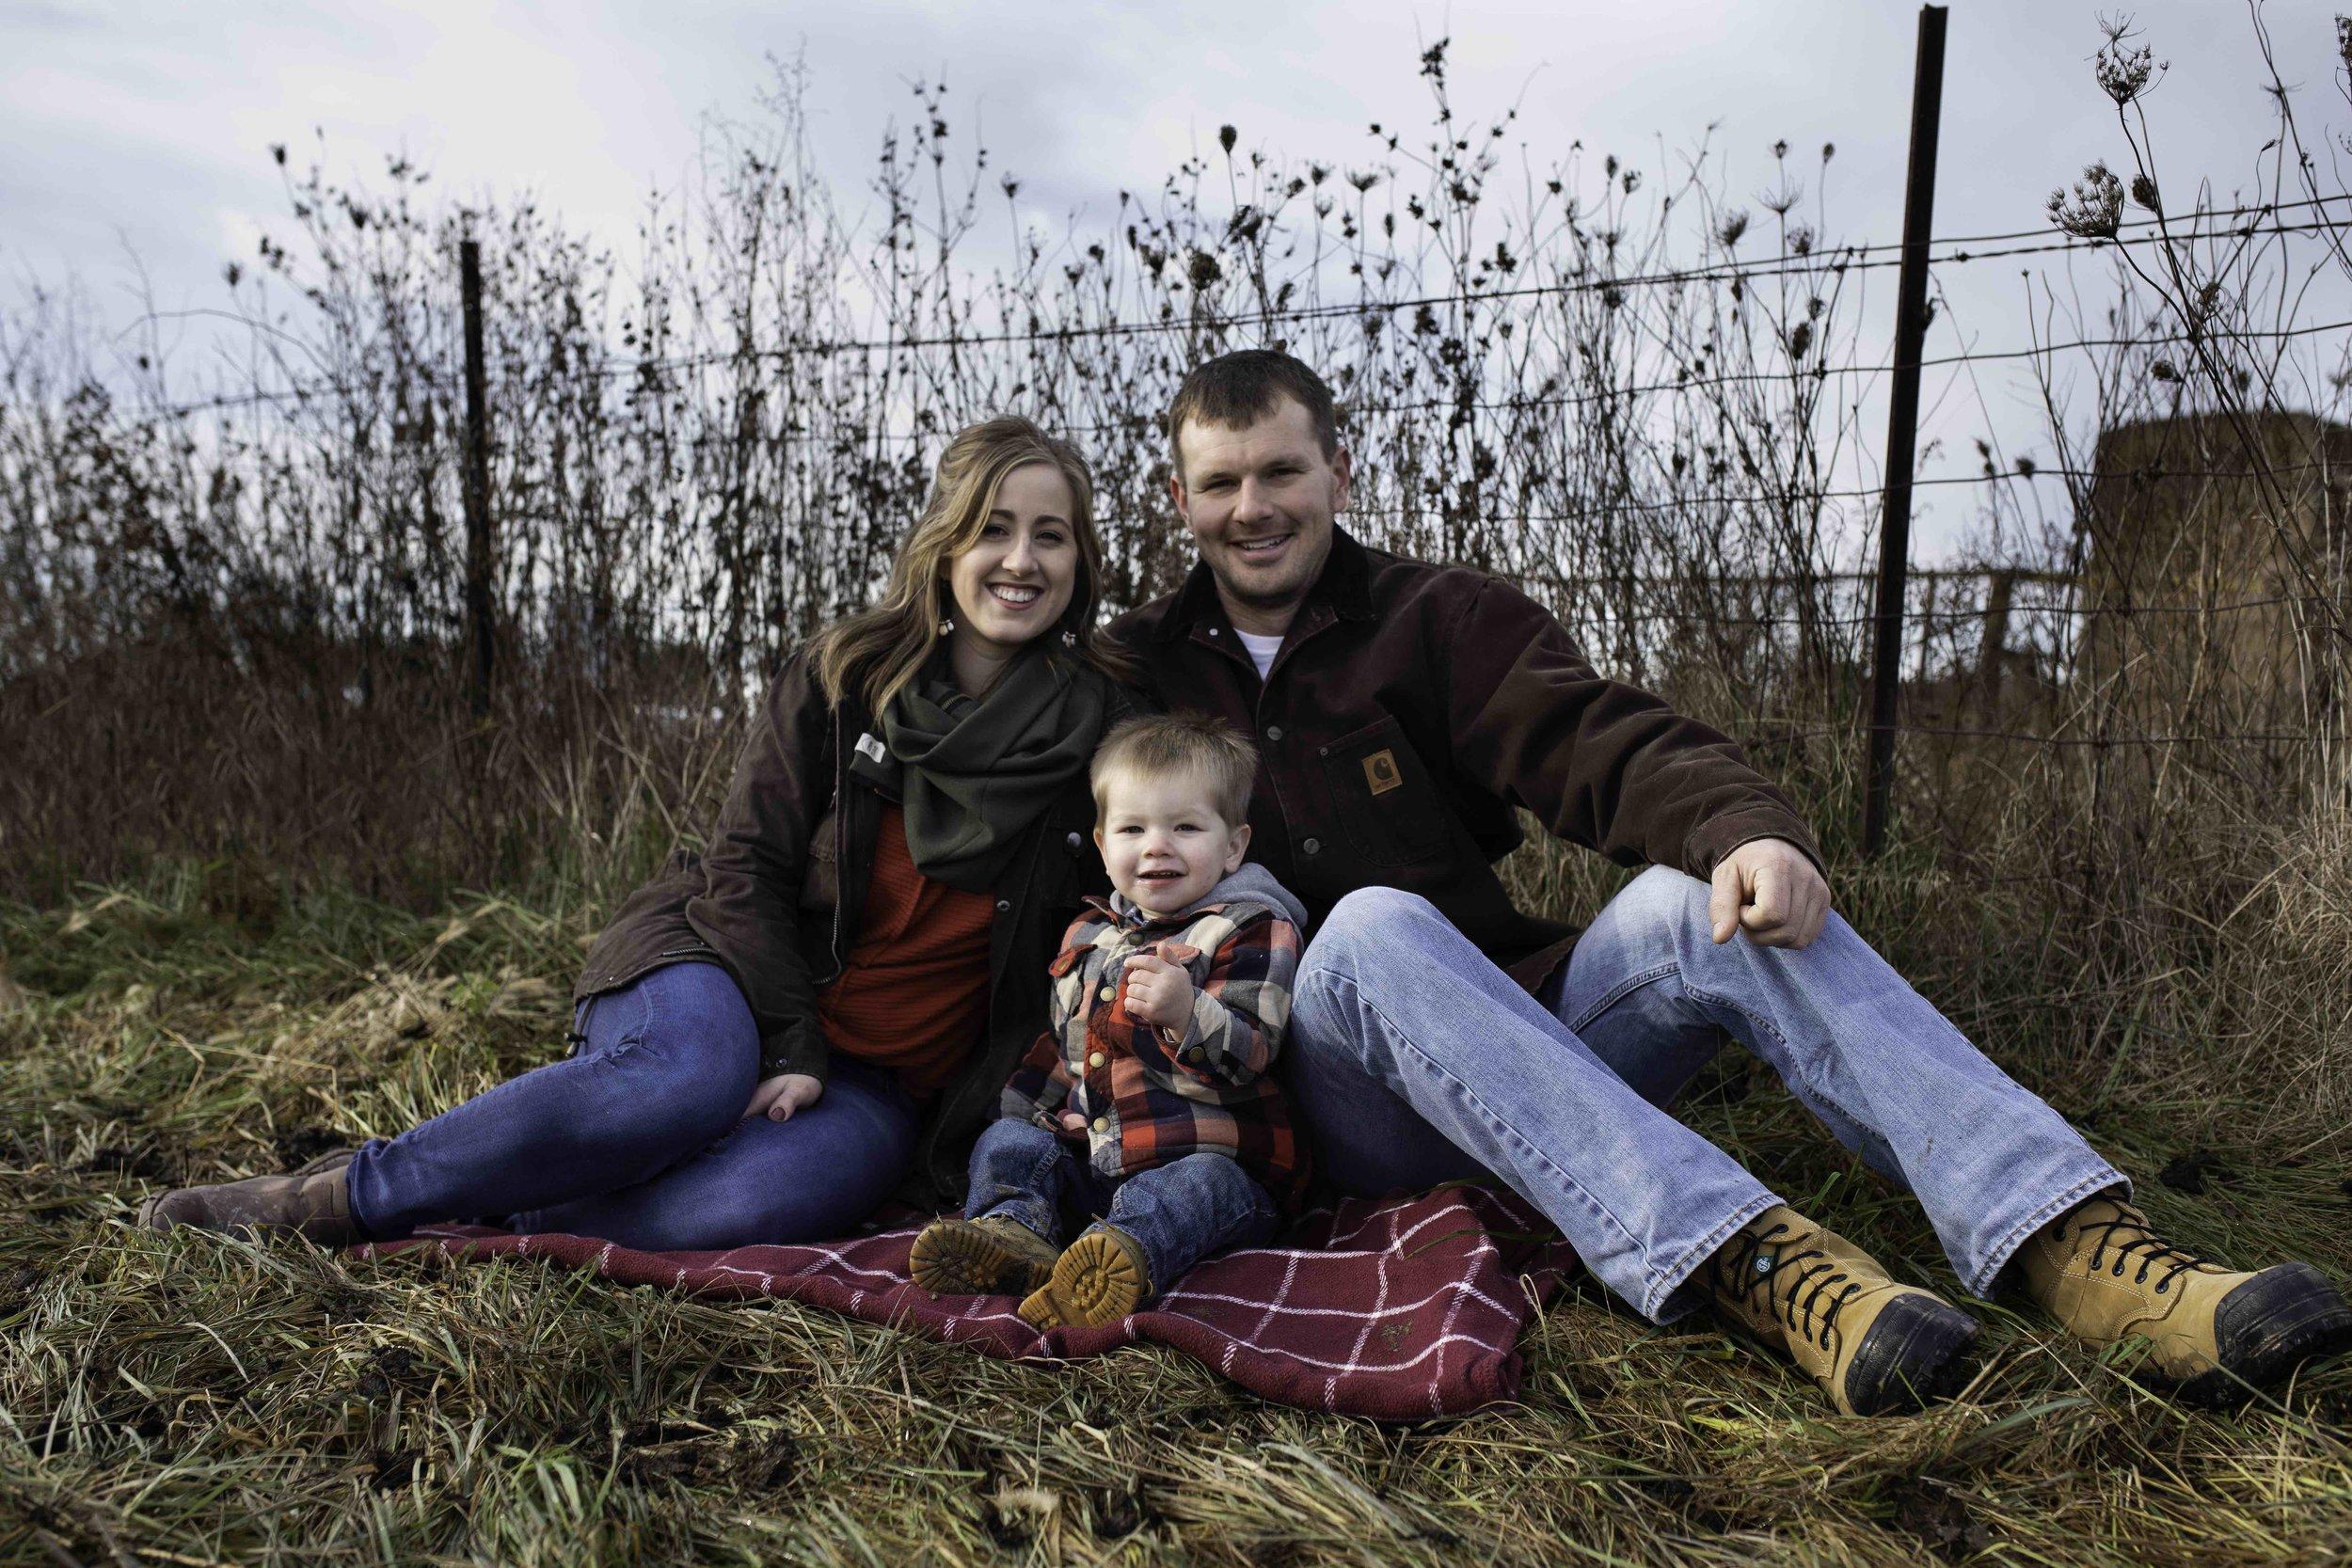 Jodie-Aldred-Photography-Chatham-Kent-Elgin-Middlesex-London-Ontario-Farm-Family-farm.jpg